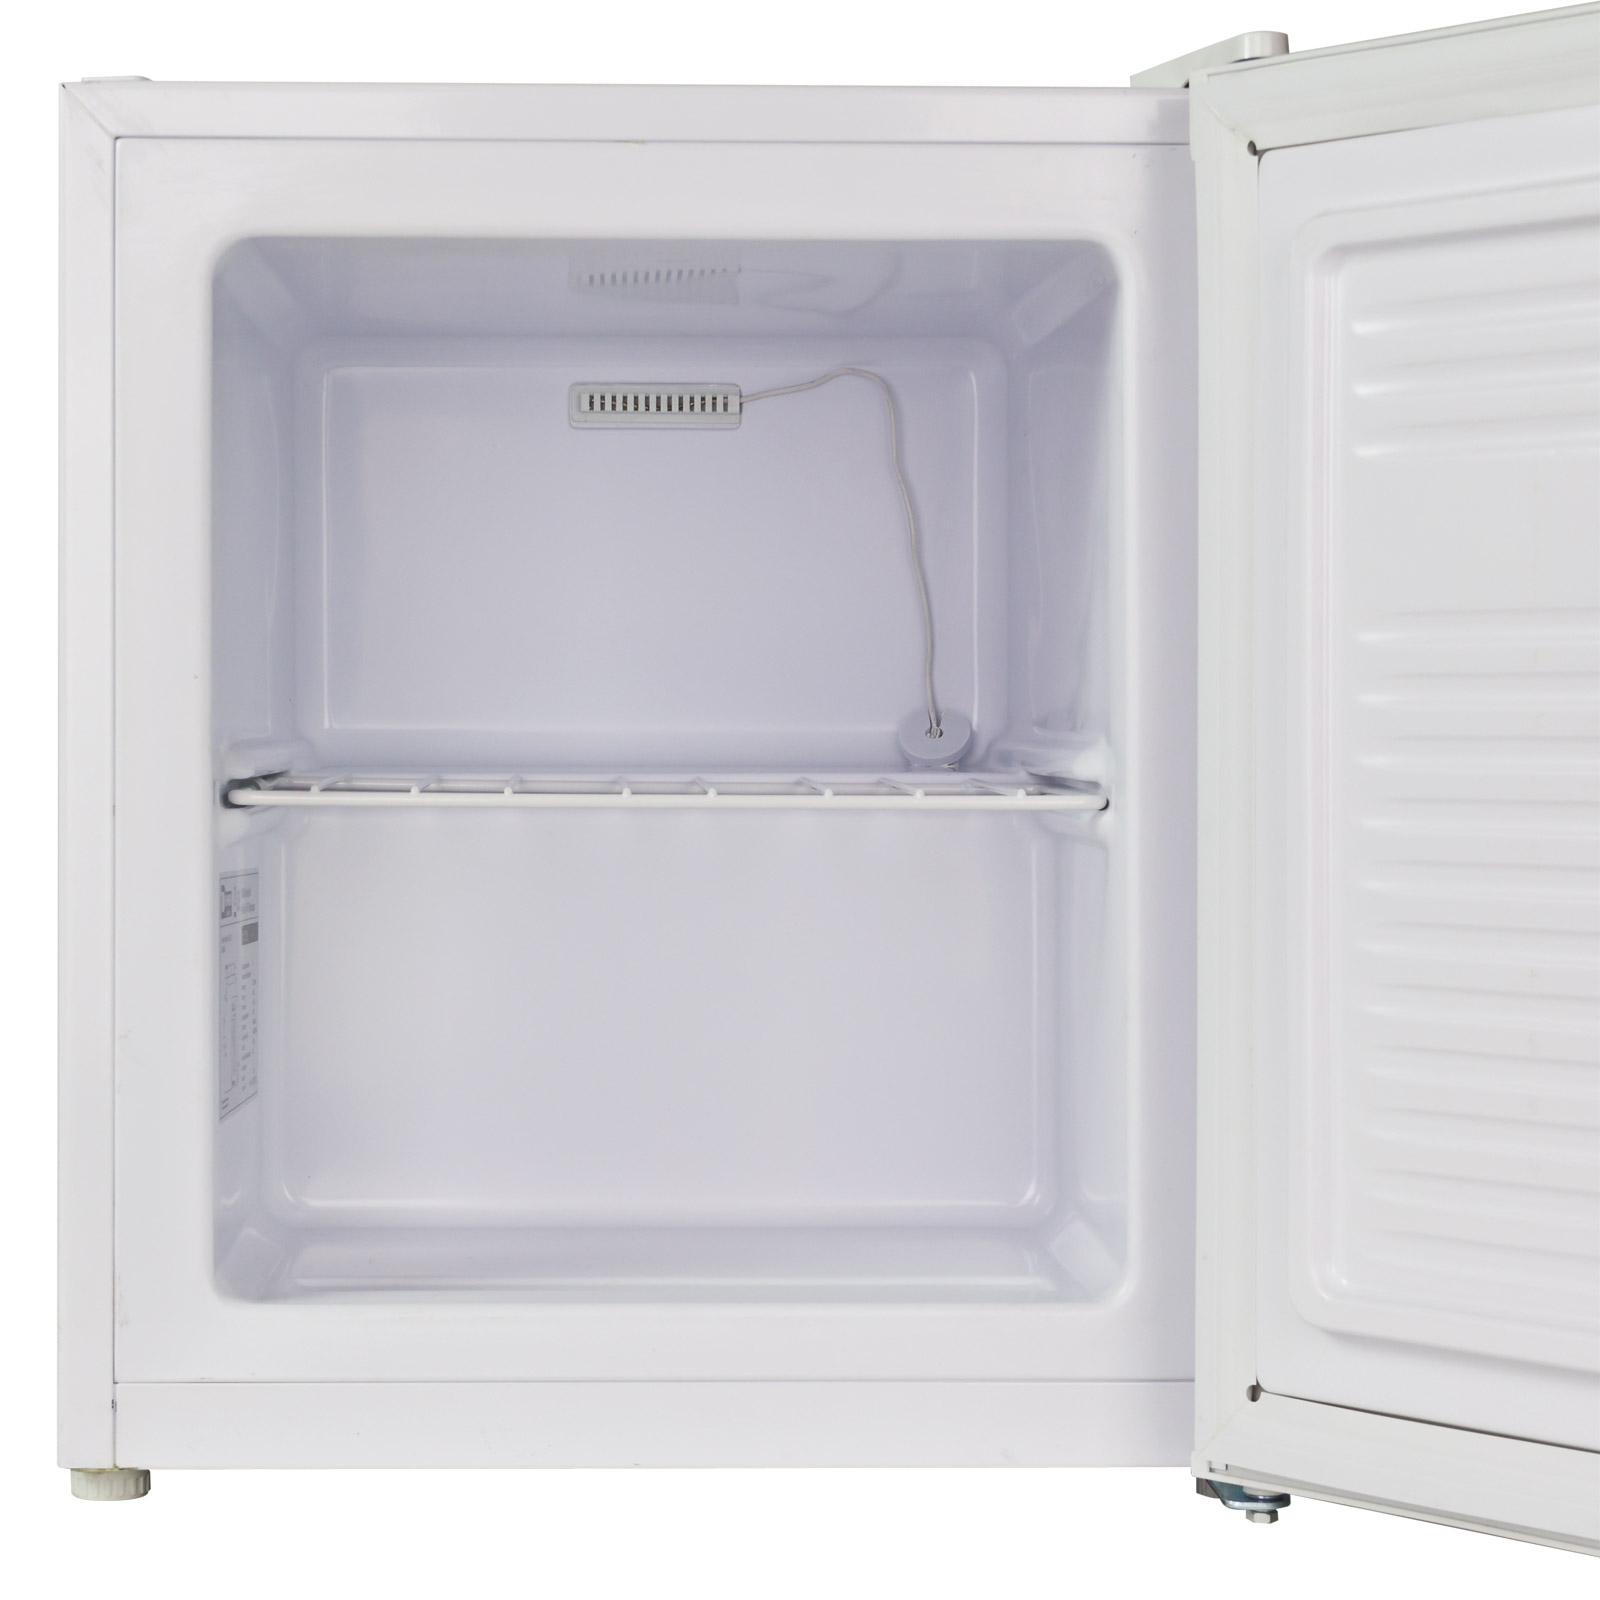 gefrierbox mini gefriertruhe gefrierschrank single 230v a 34 l neu ovp 919113 ebay. Black Bedroom Furniture Sets. Home Design Ideas